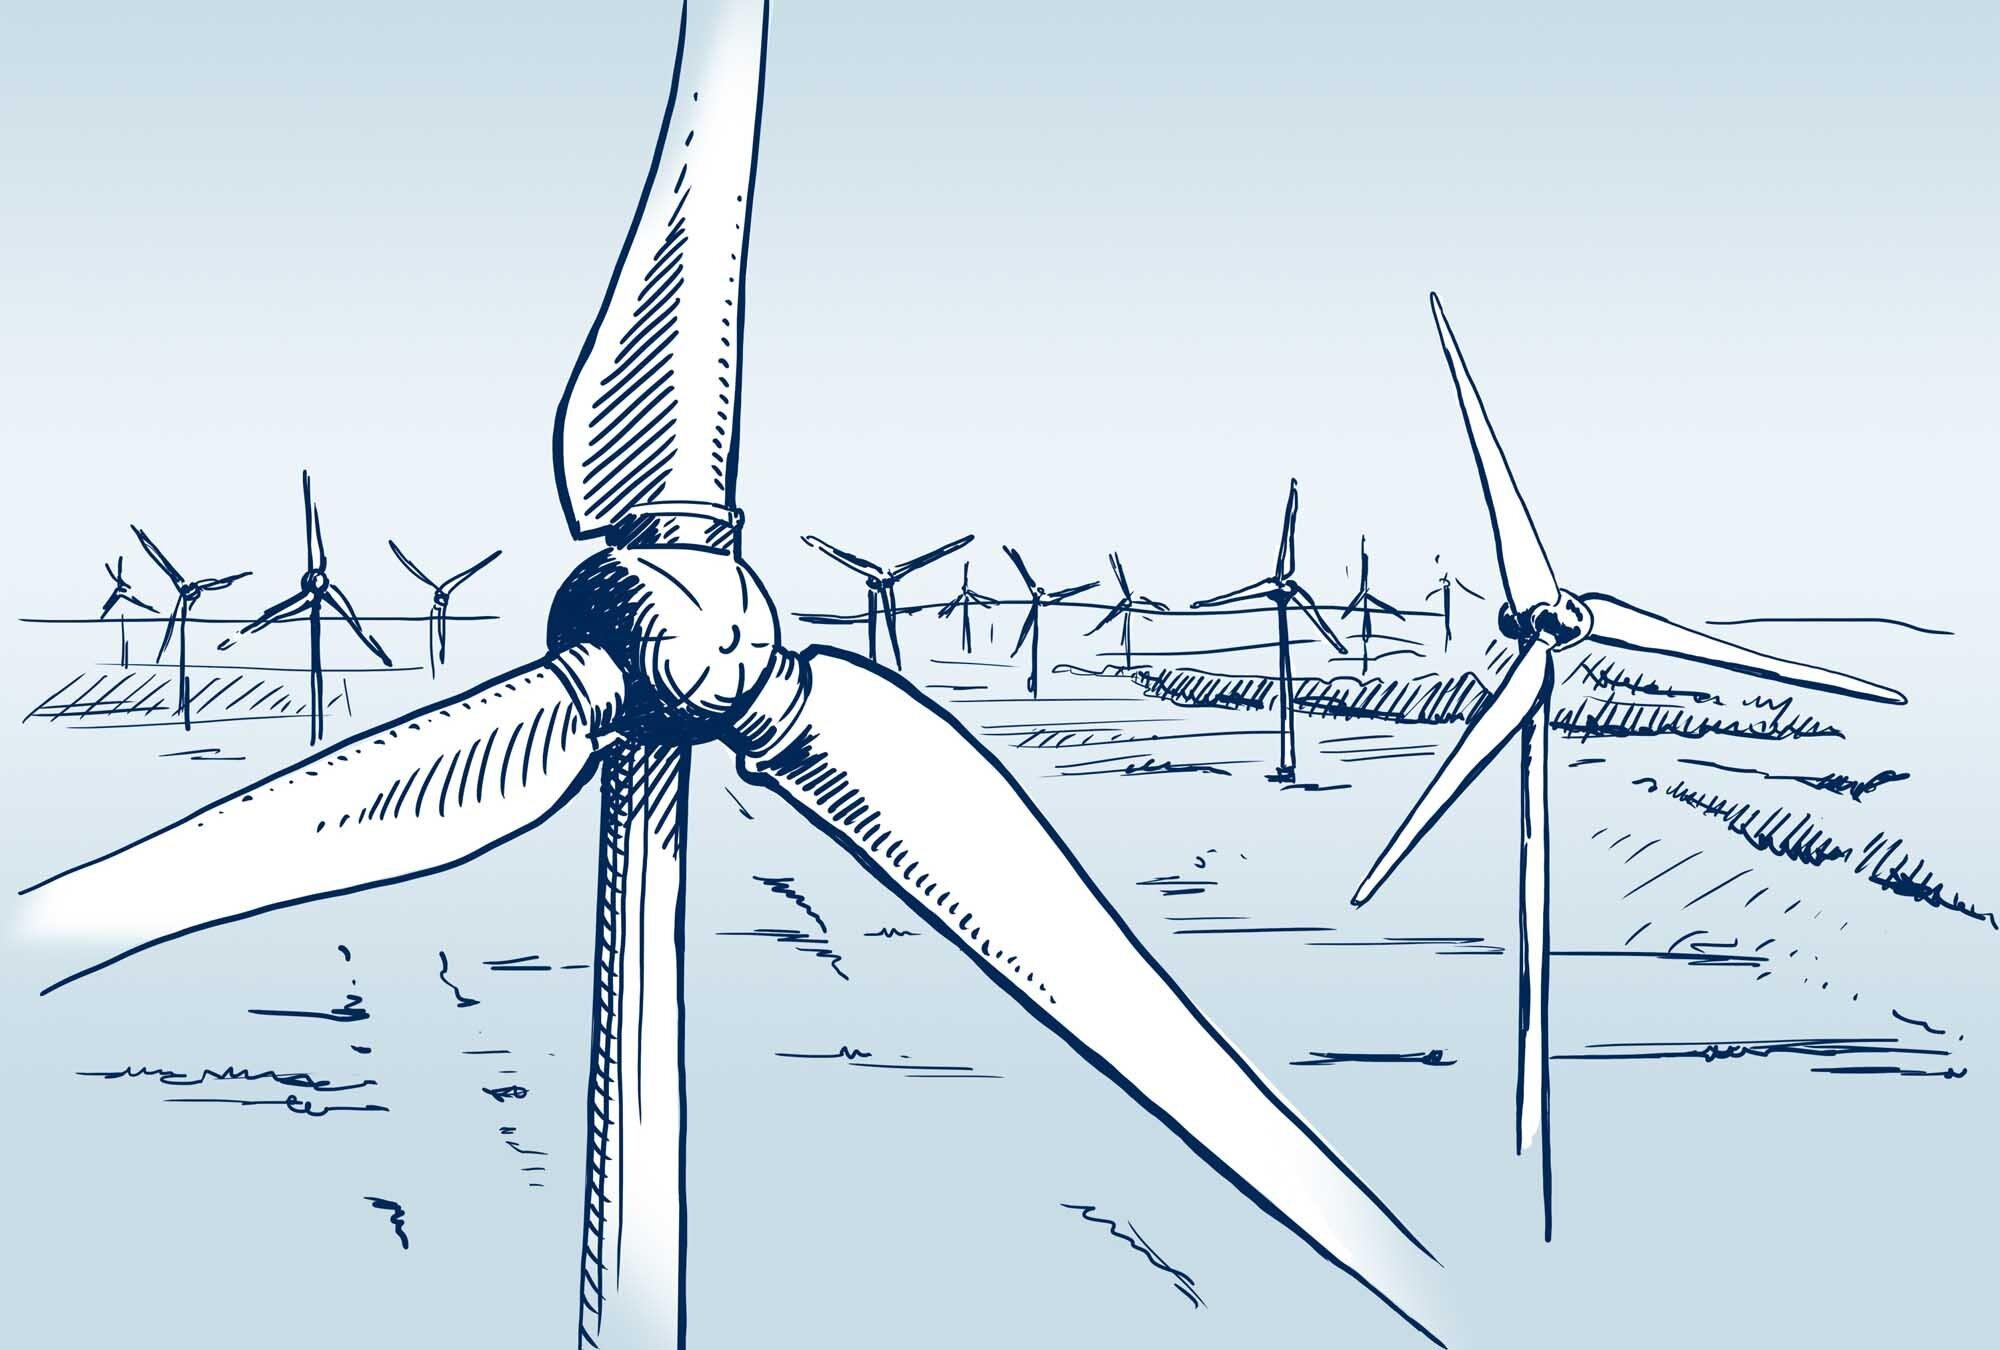 Windpark | Haslinger / Nagele, Illustration: Karlheinz Wasserbacher